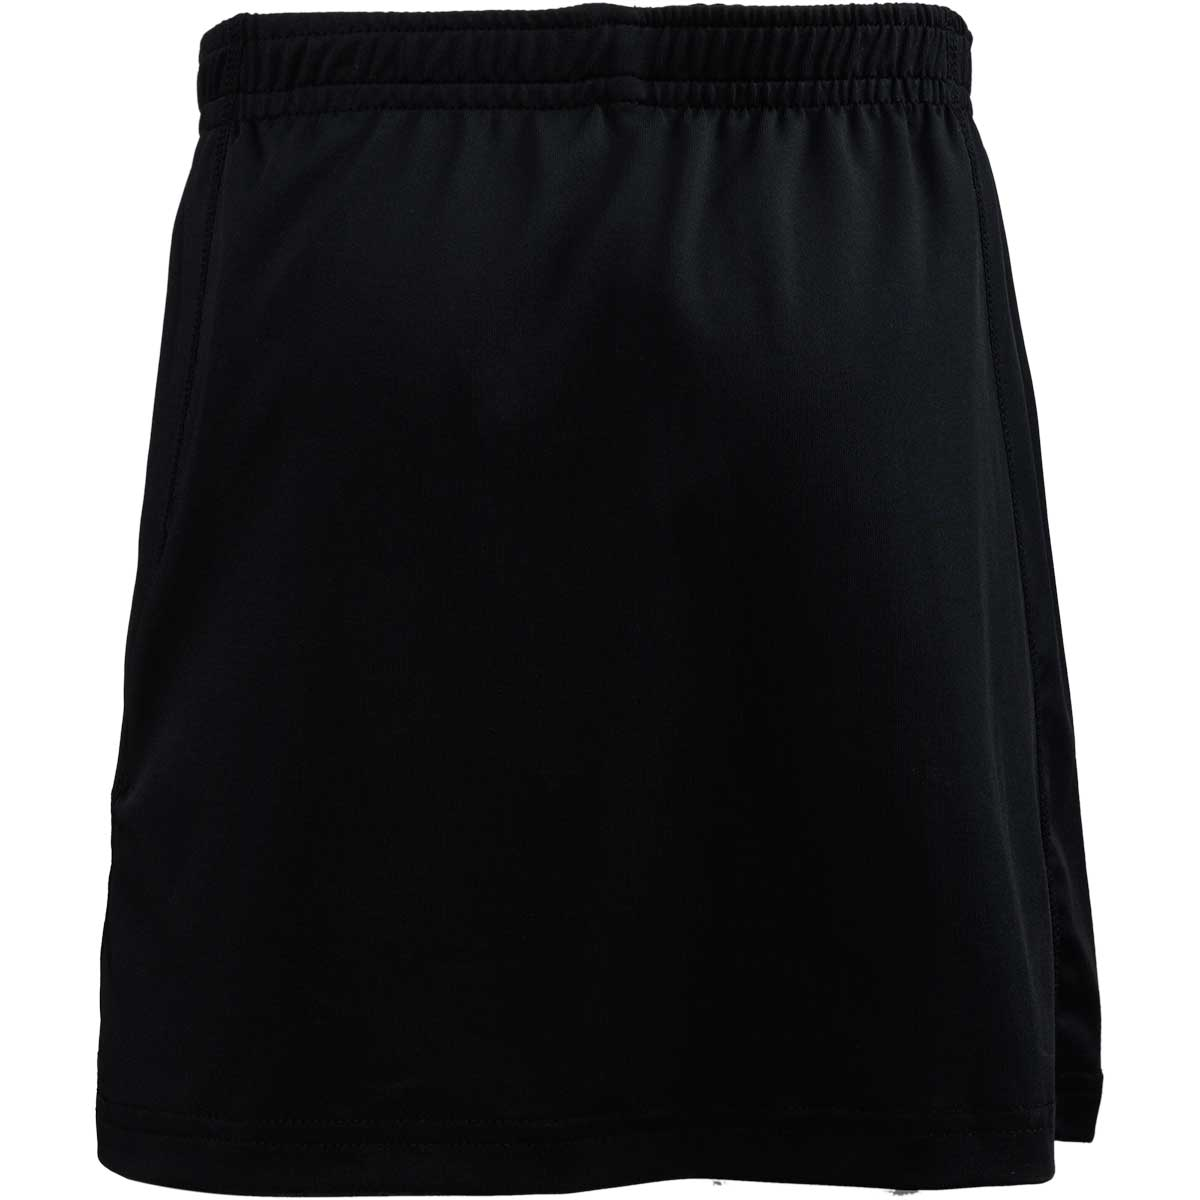 FZ FORZA Zari Jr skirt